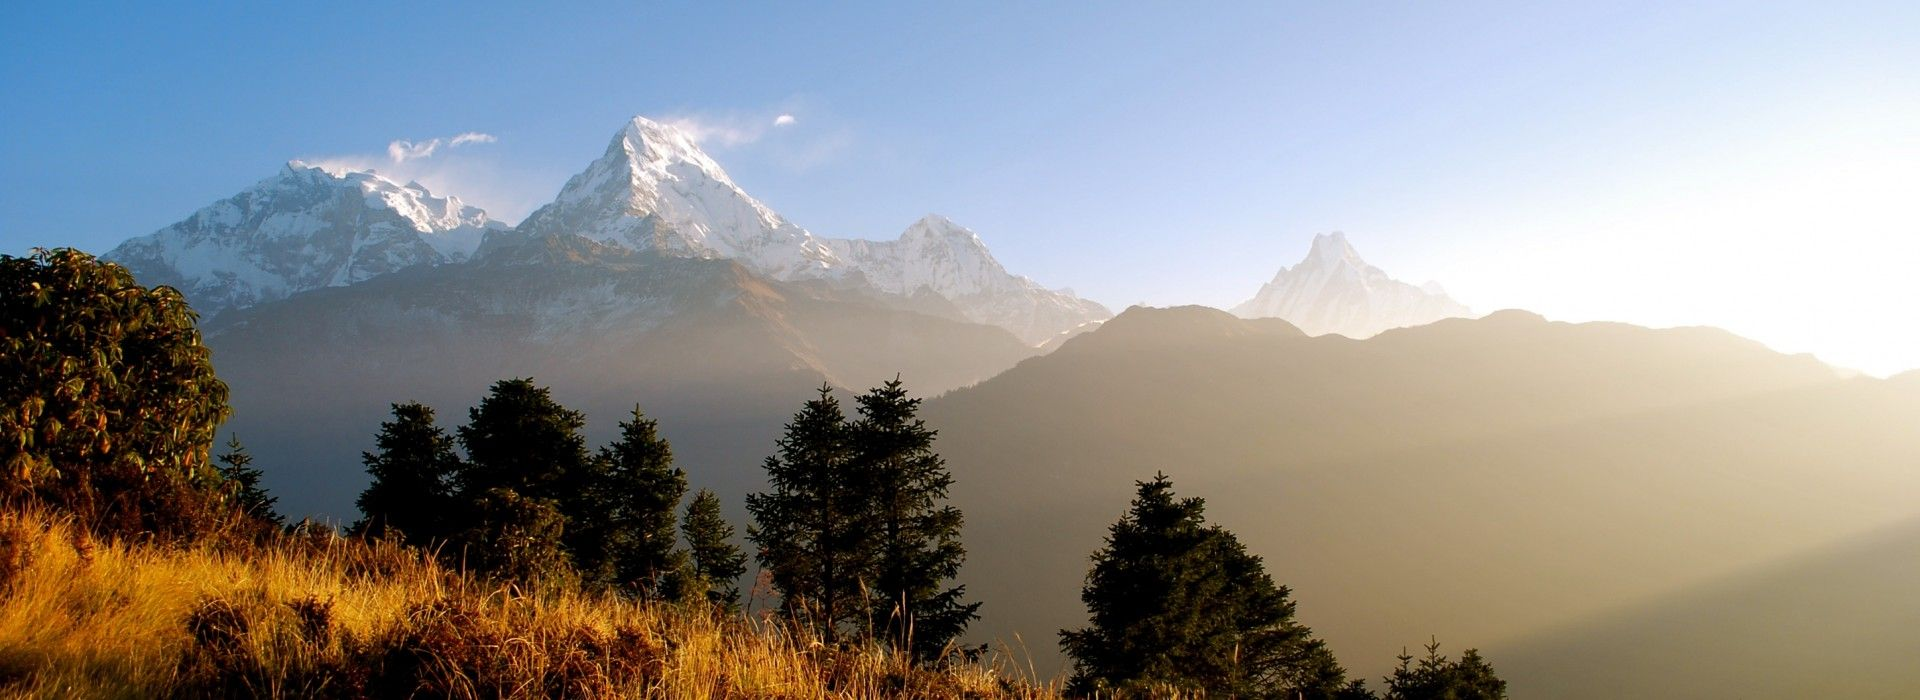 National parks Tours in Kathmandu